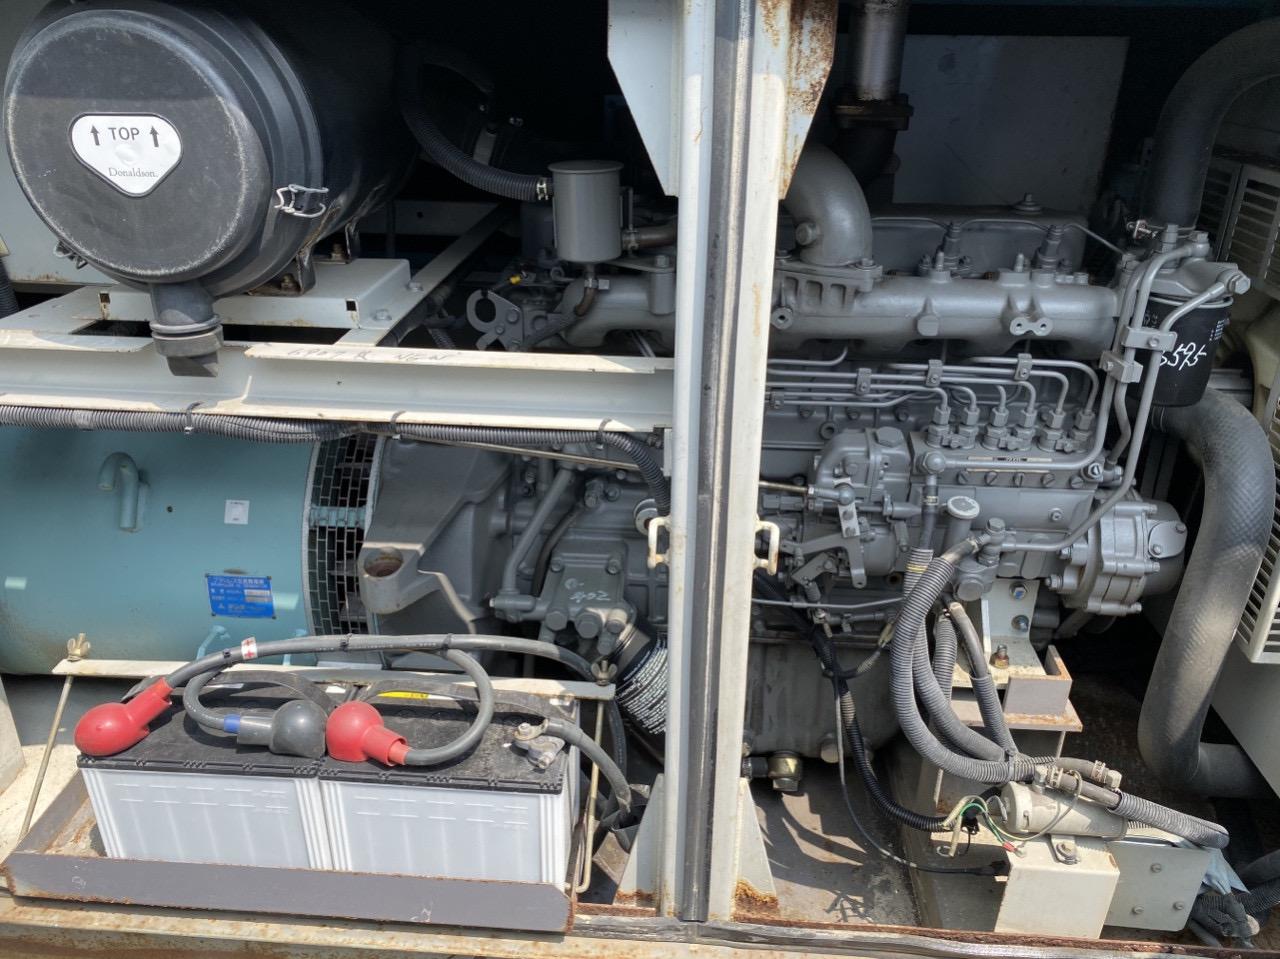 Máy phát điện Isuzu nhập khẩu nhật bản